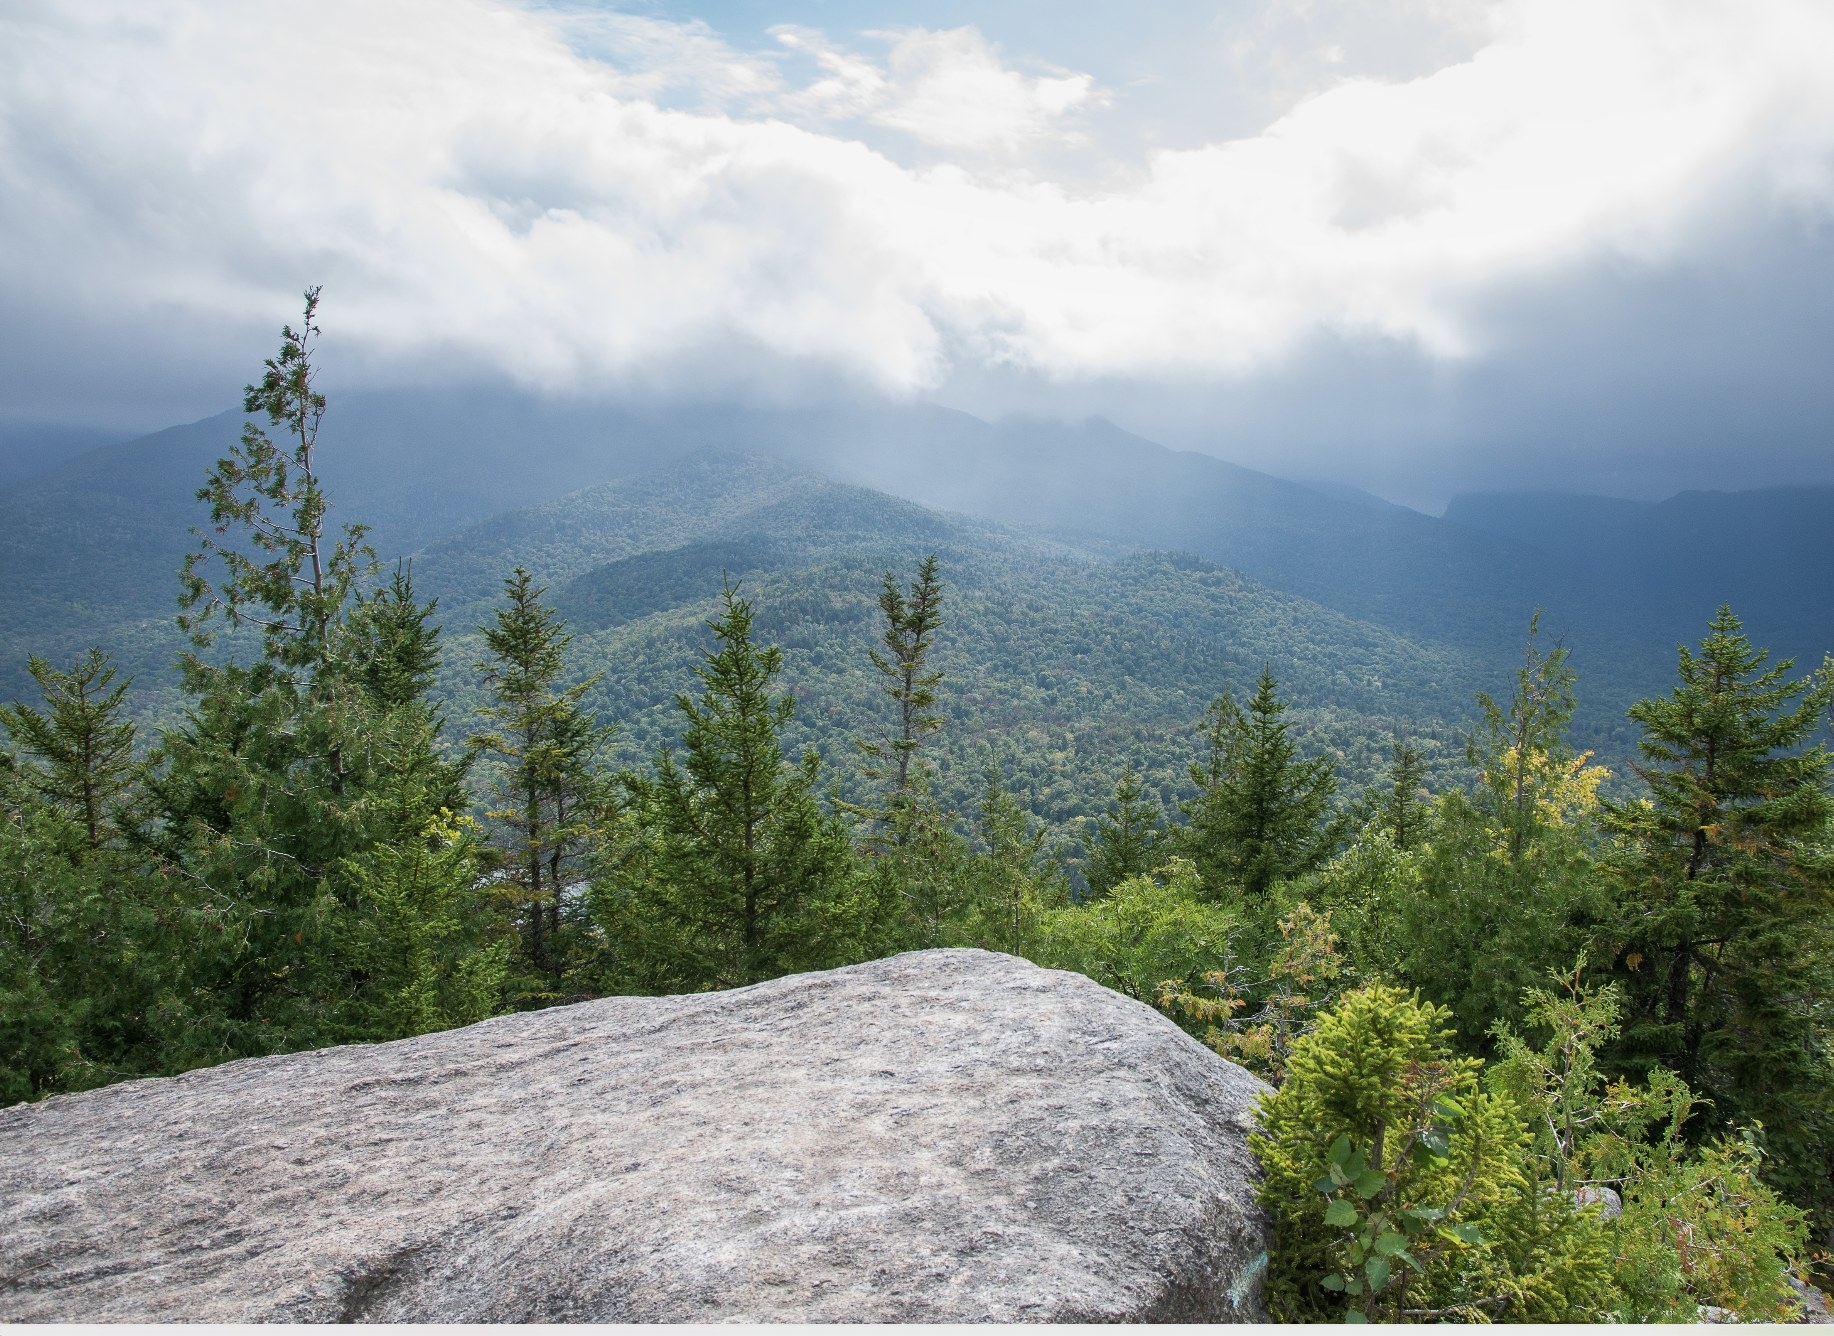 Mount Jo Mountain in Lake Placid.